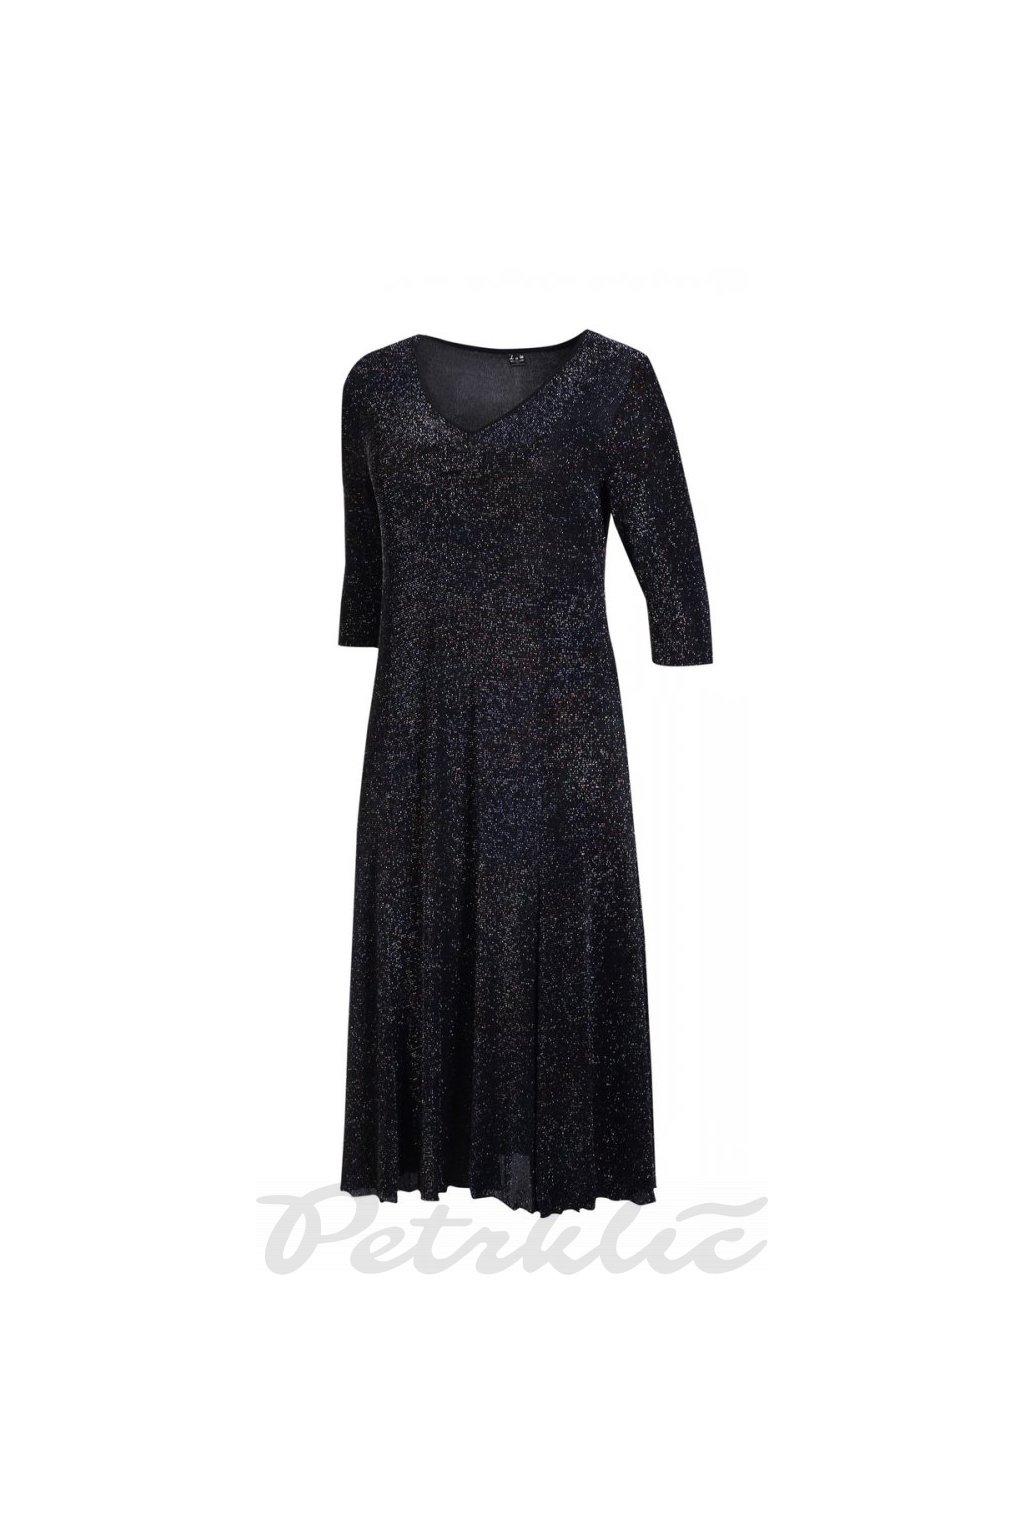 VENDULA šaty 110 - 115 cm